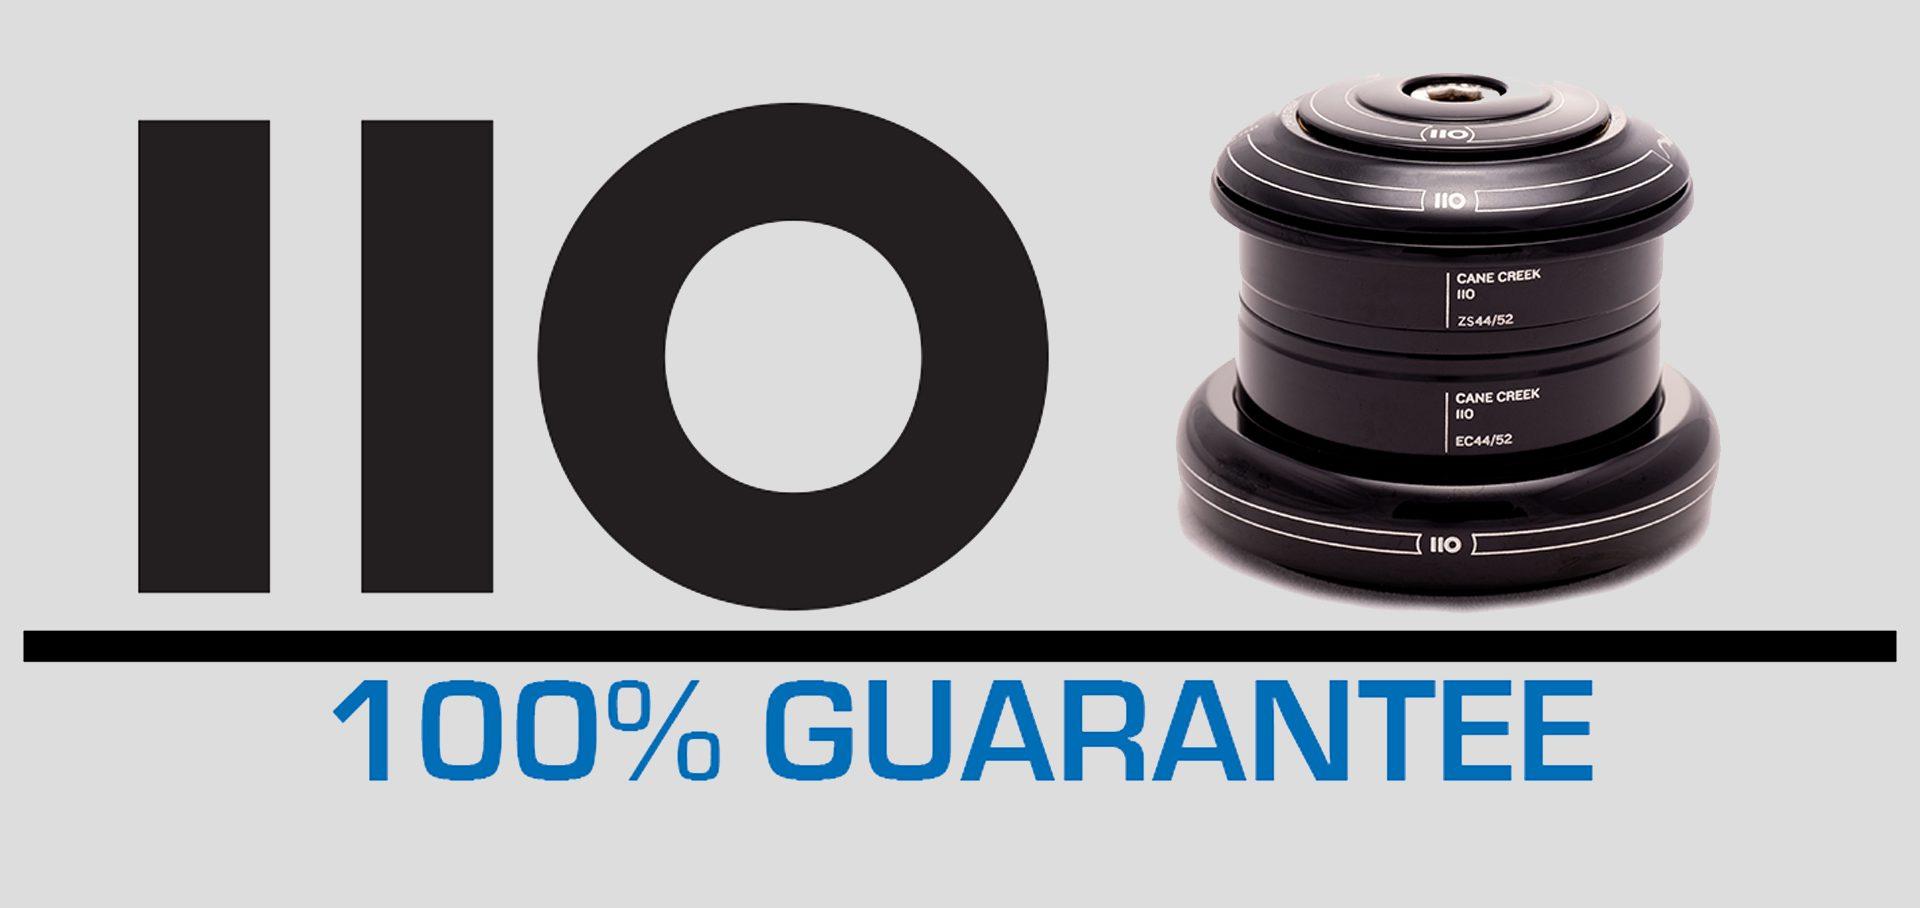 110 Guarantee